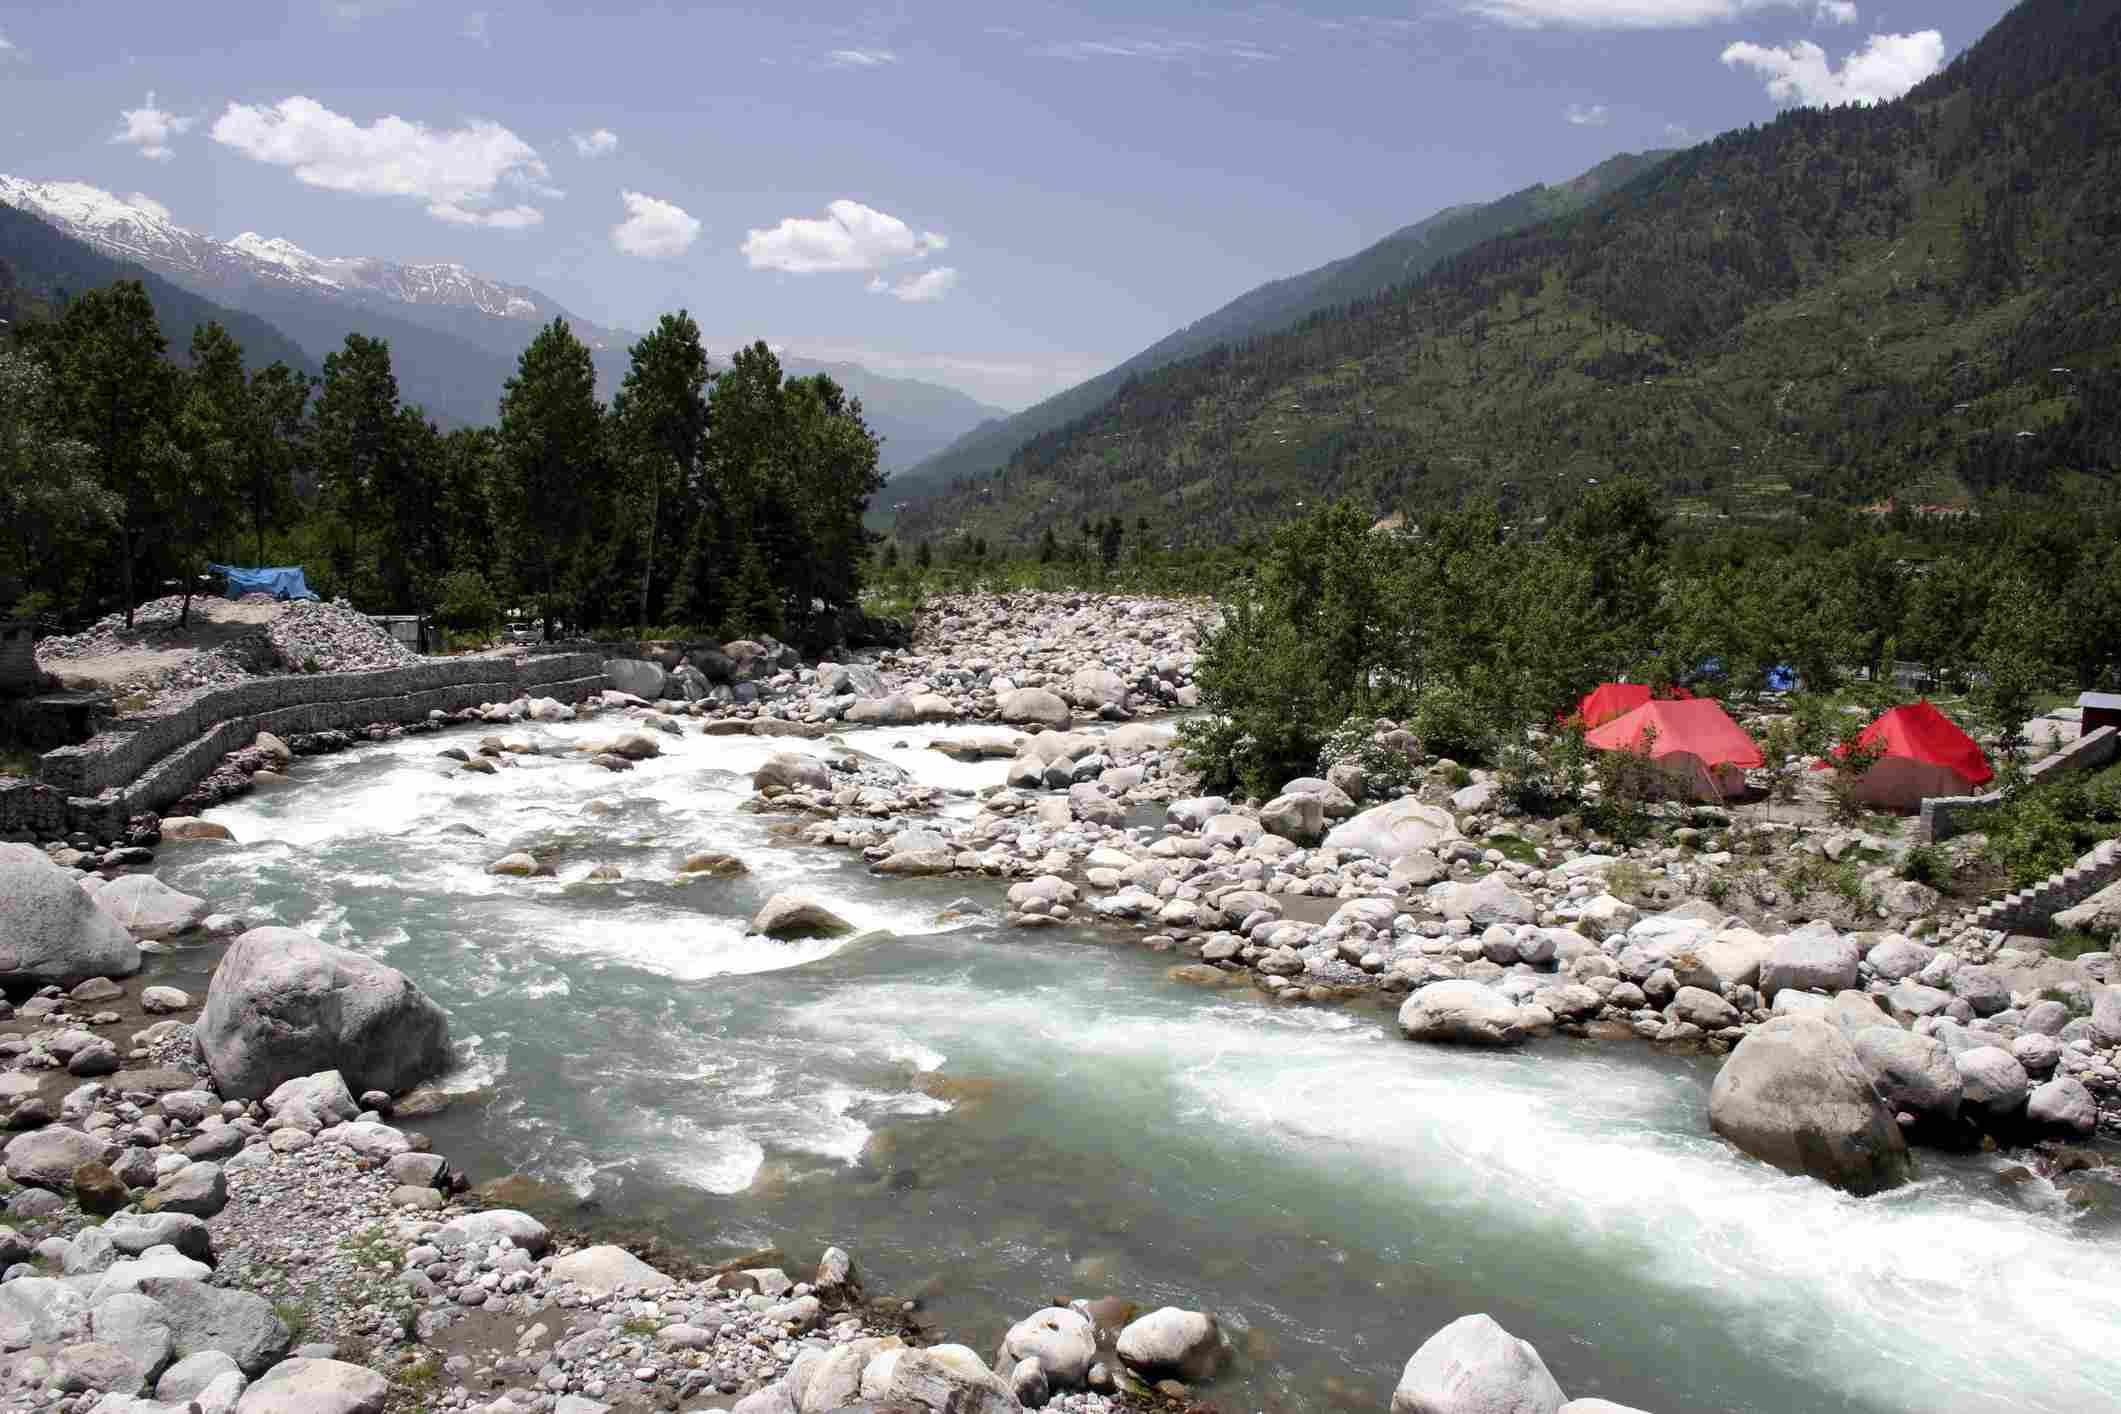 Beas river at Nehru Kund in Manali, Himachal Pradesh, India